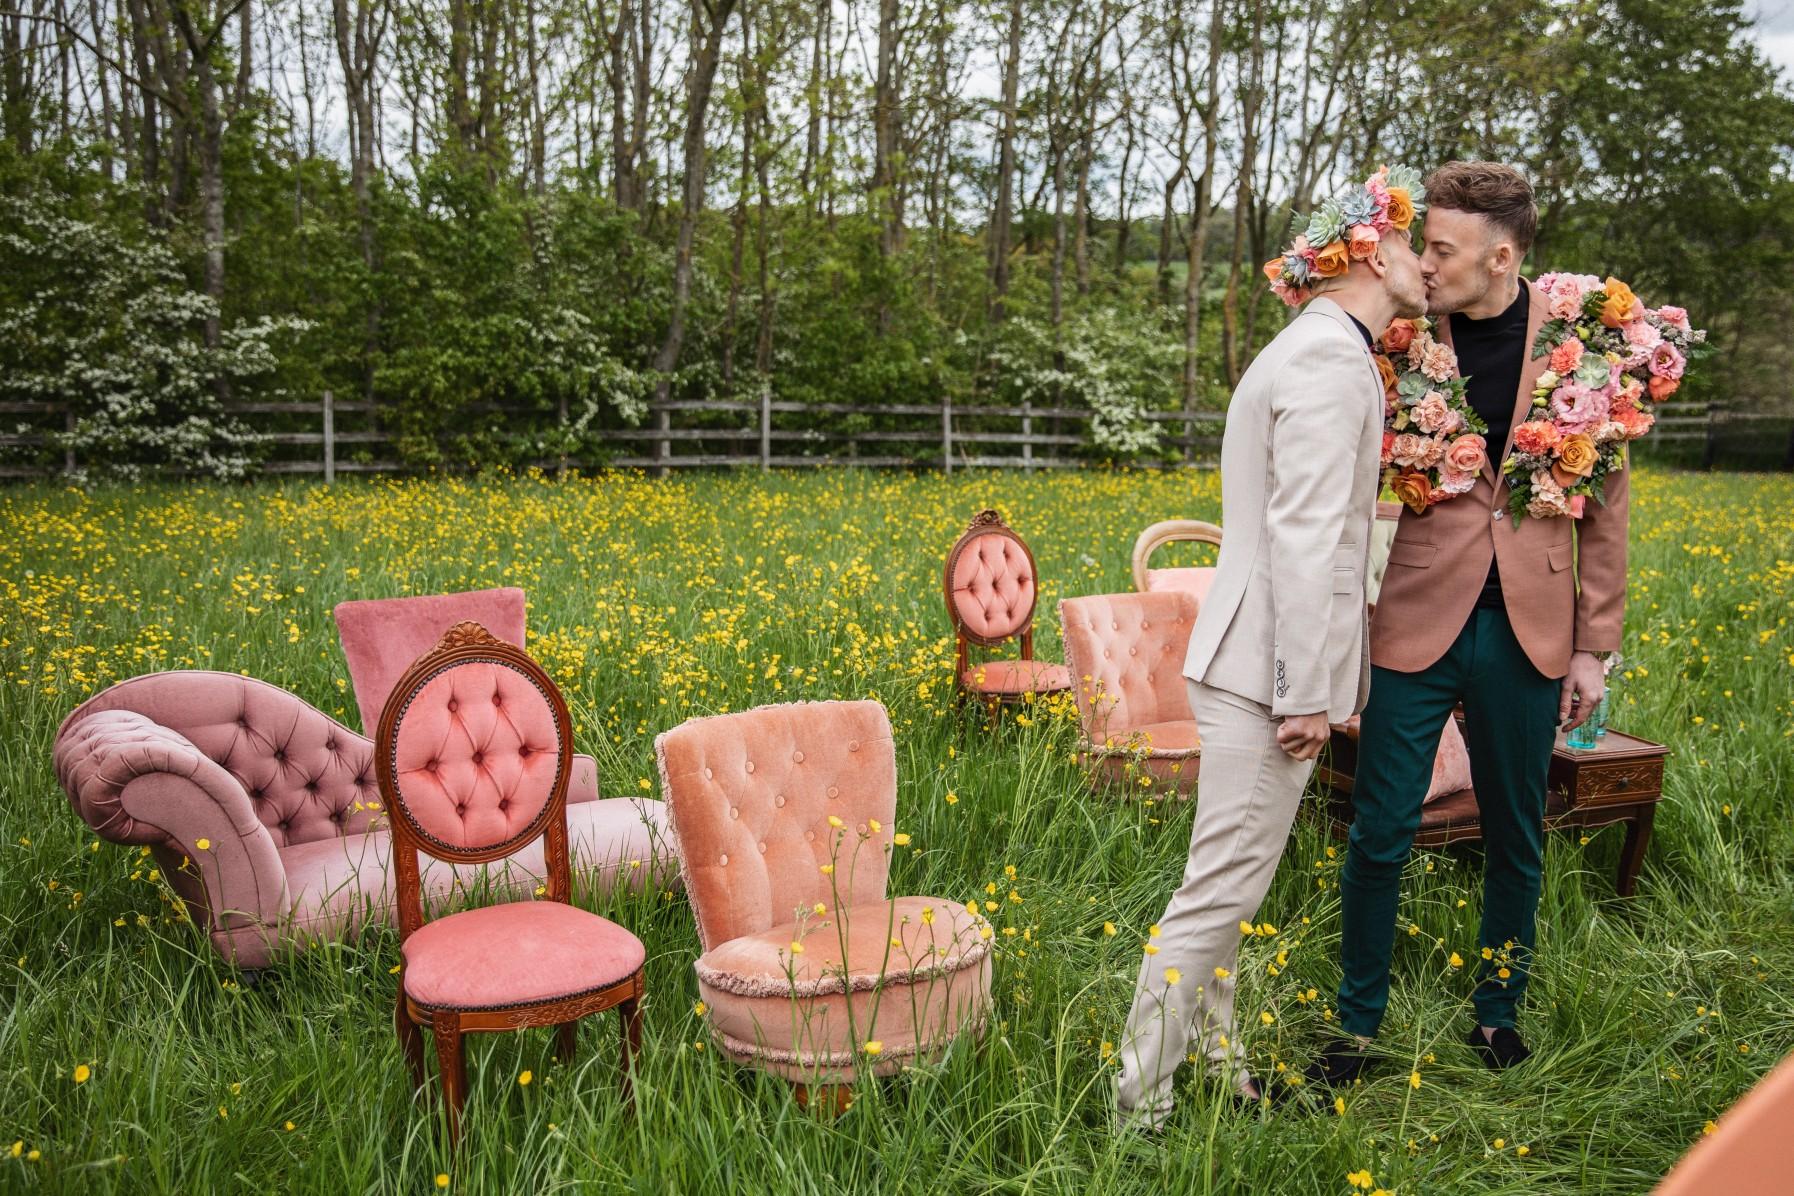 bohemian gay wedding - vintage wedding props - unique wedding ceremony - unique wedding flowers -